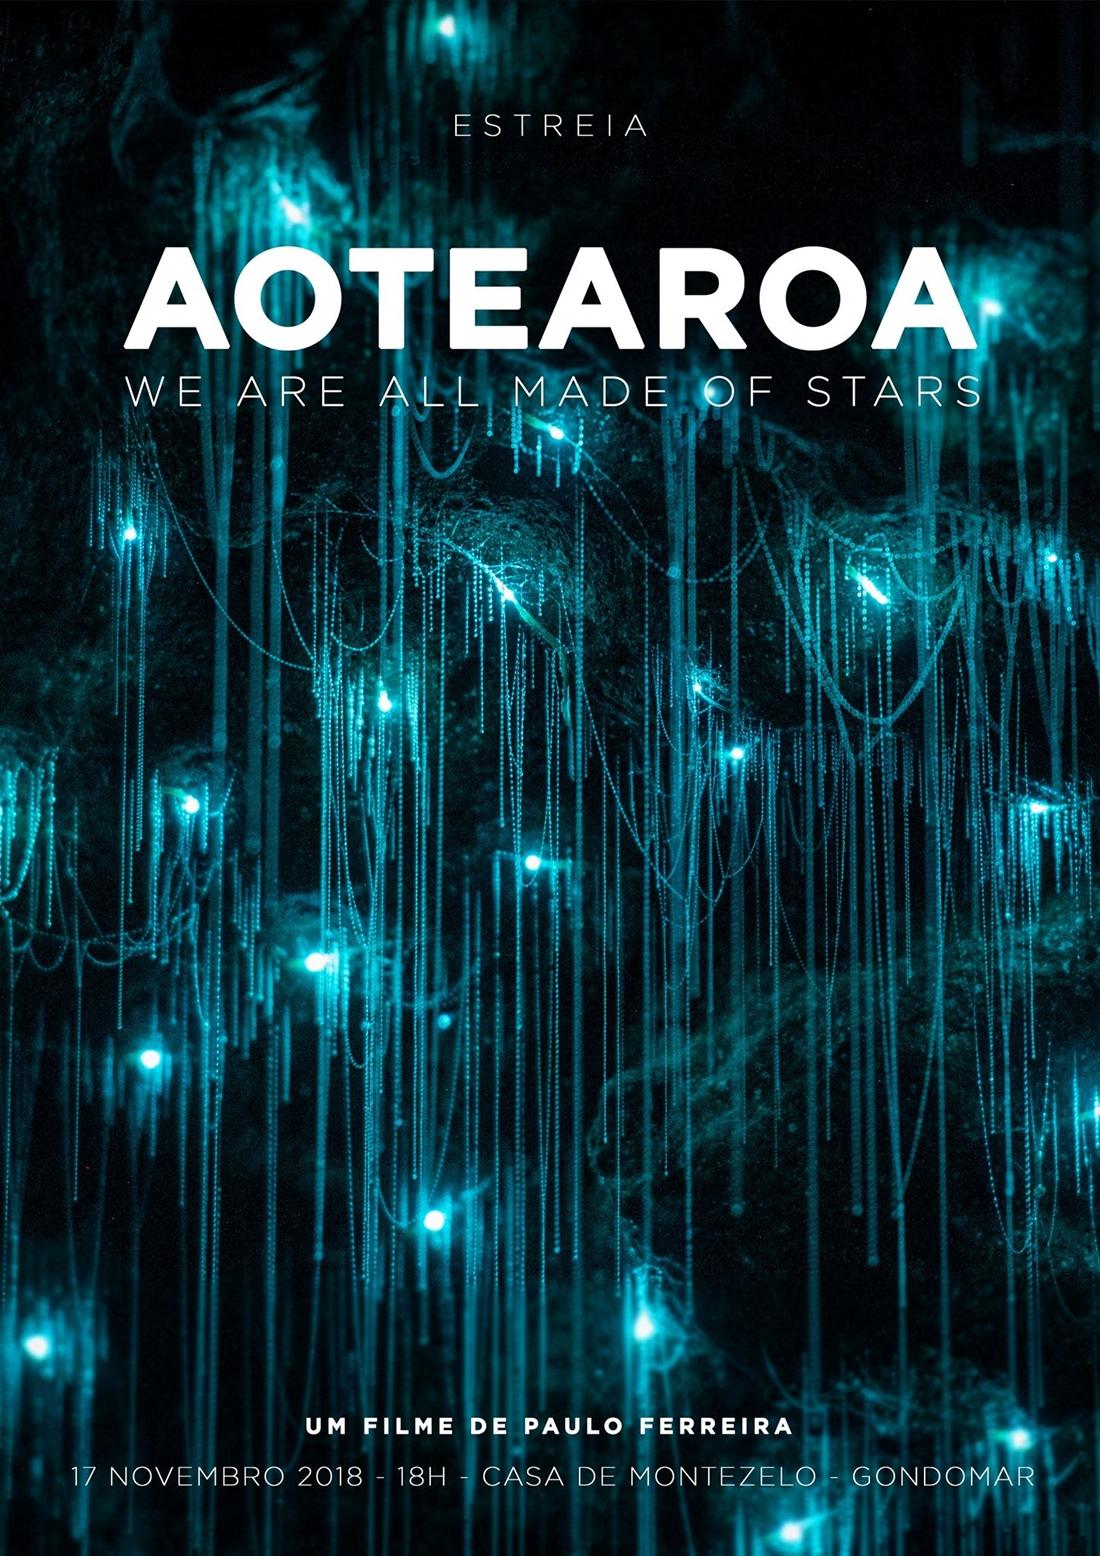 aotearoa we are all made of stars